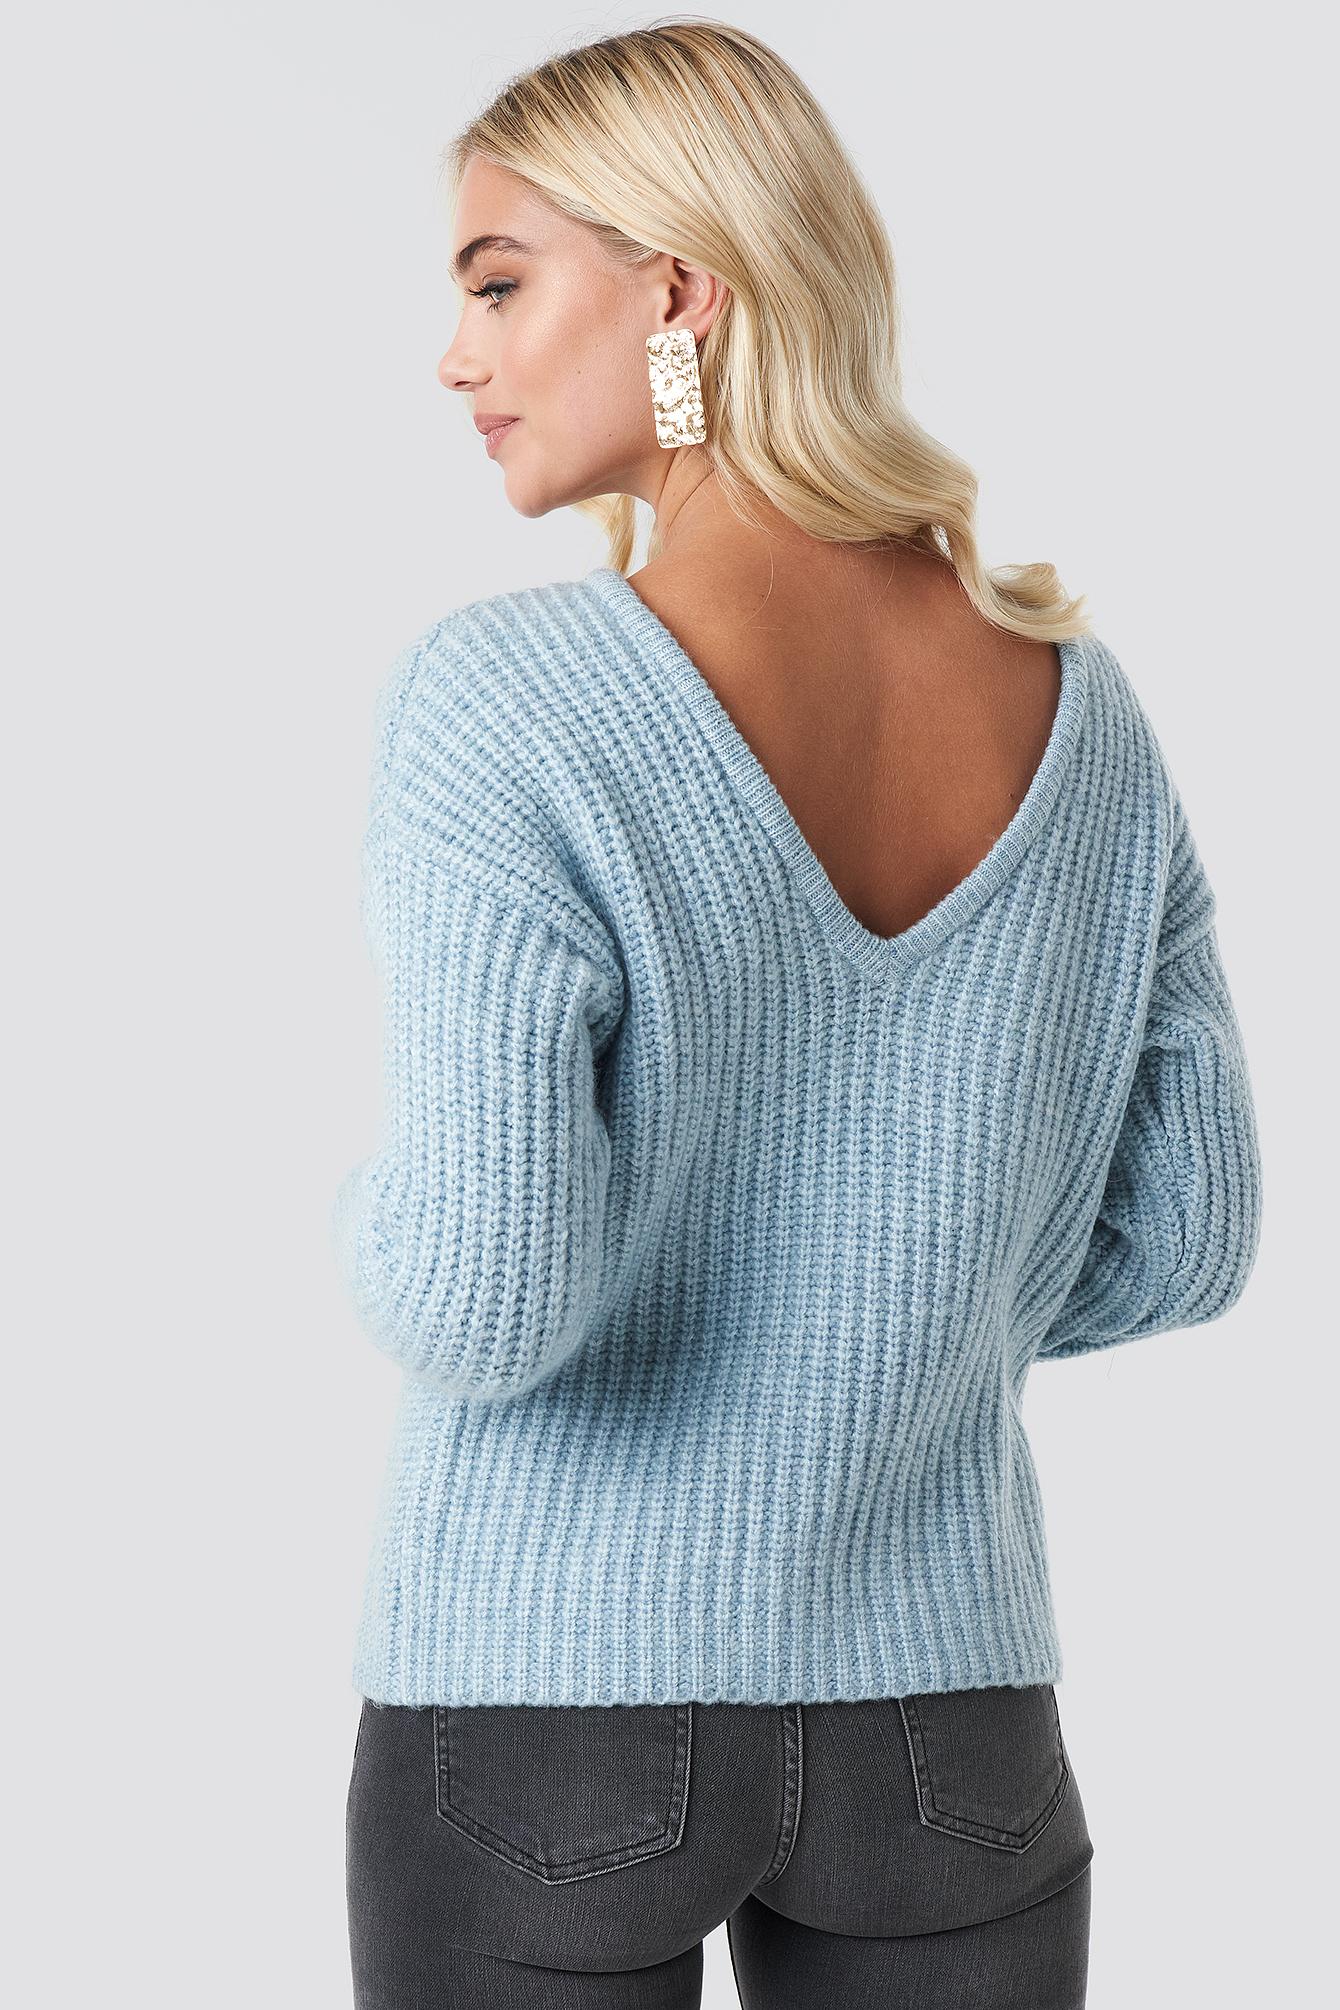 Boxy V back Knitted Sweater